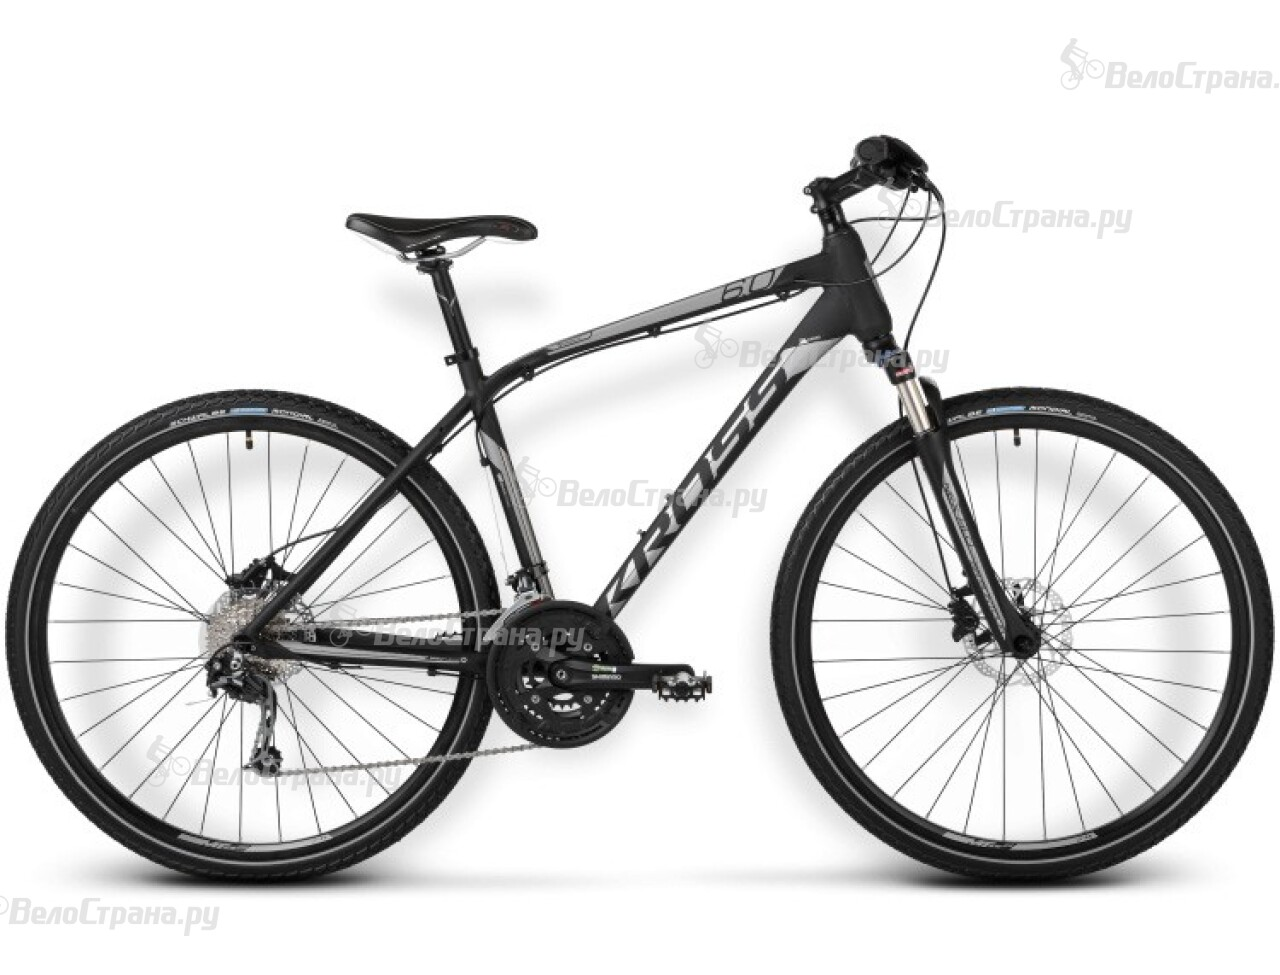 Велосипед Kross EVADO 6.0 (2016) велосипед kross evado 6 0 2016